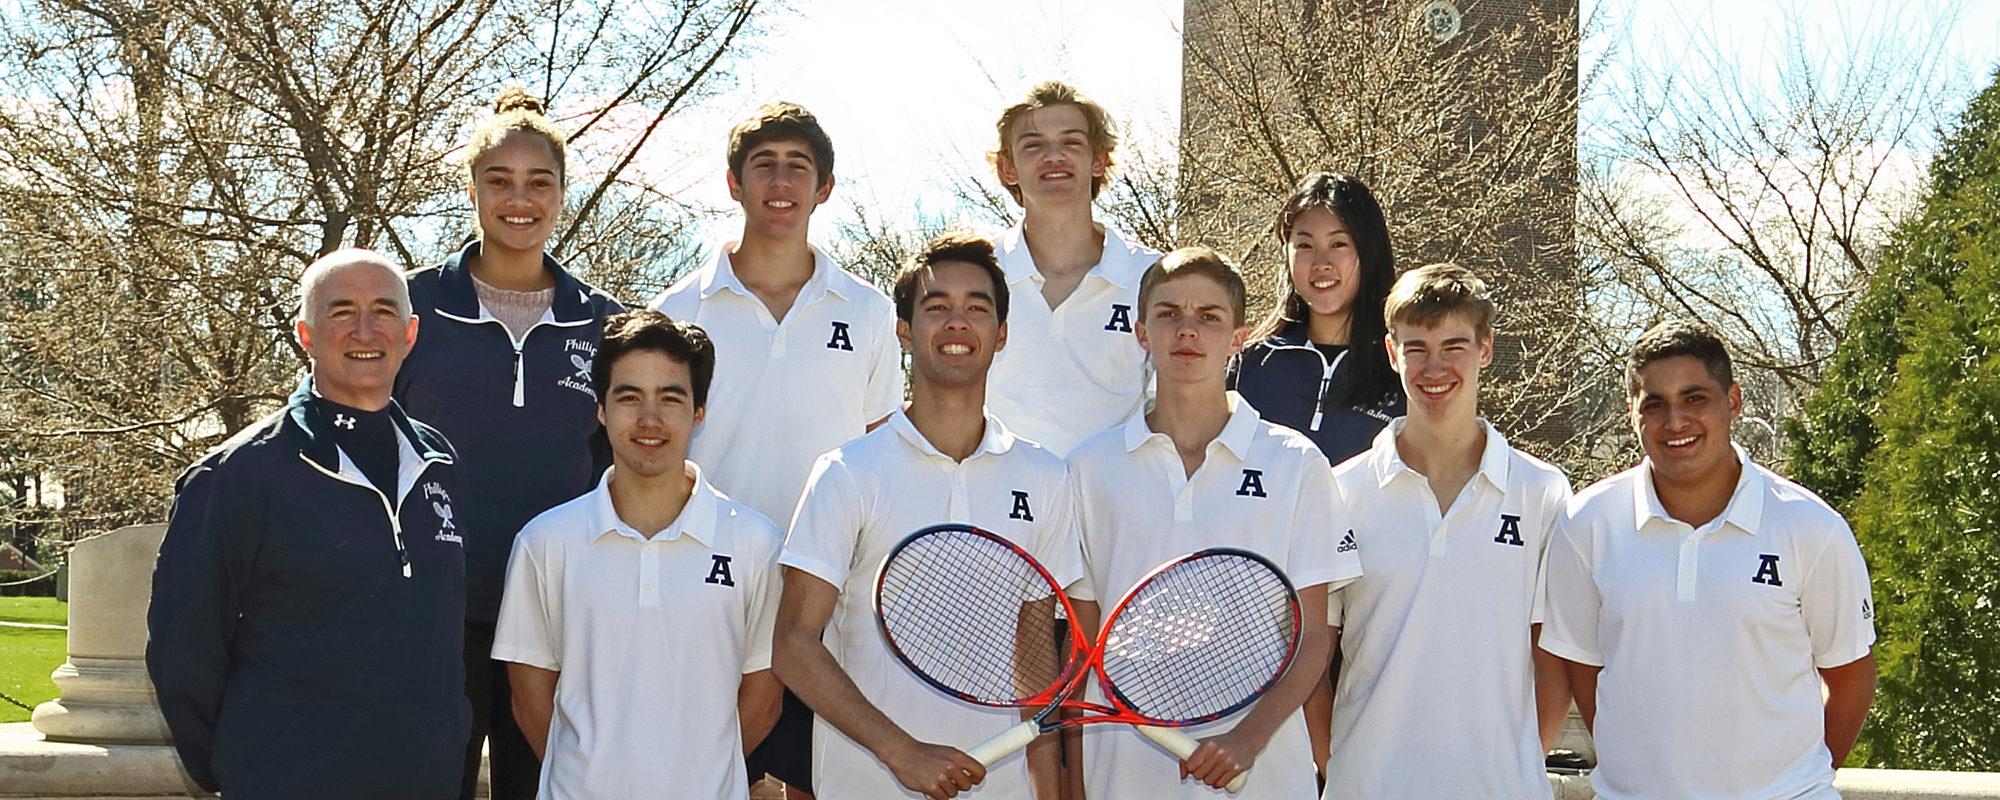 Tennis VB33